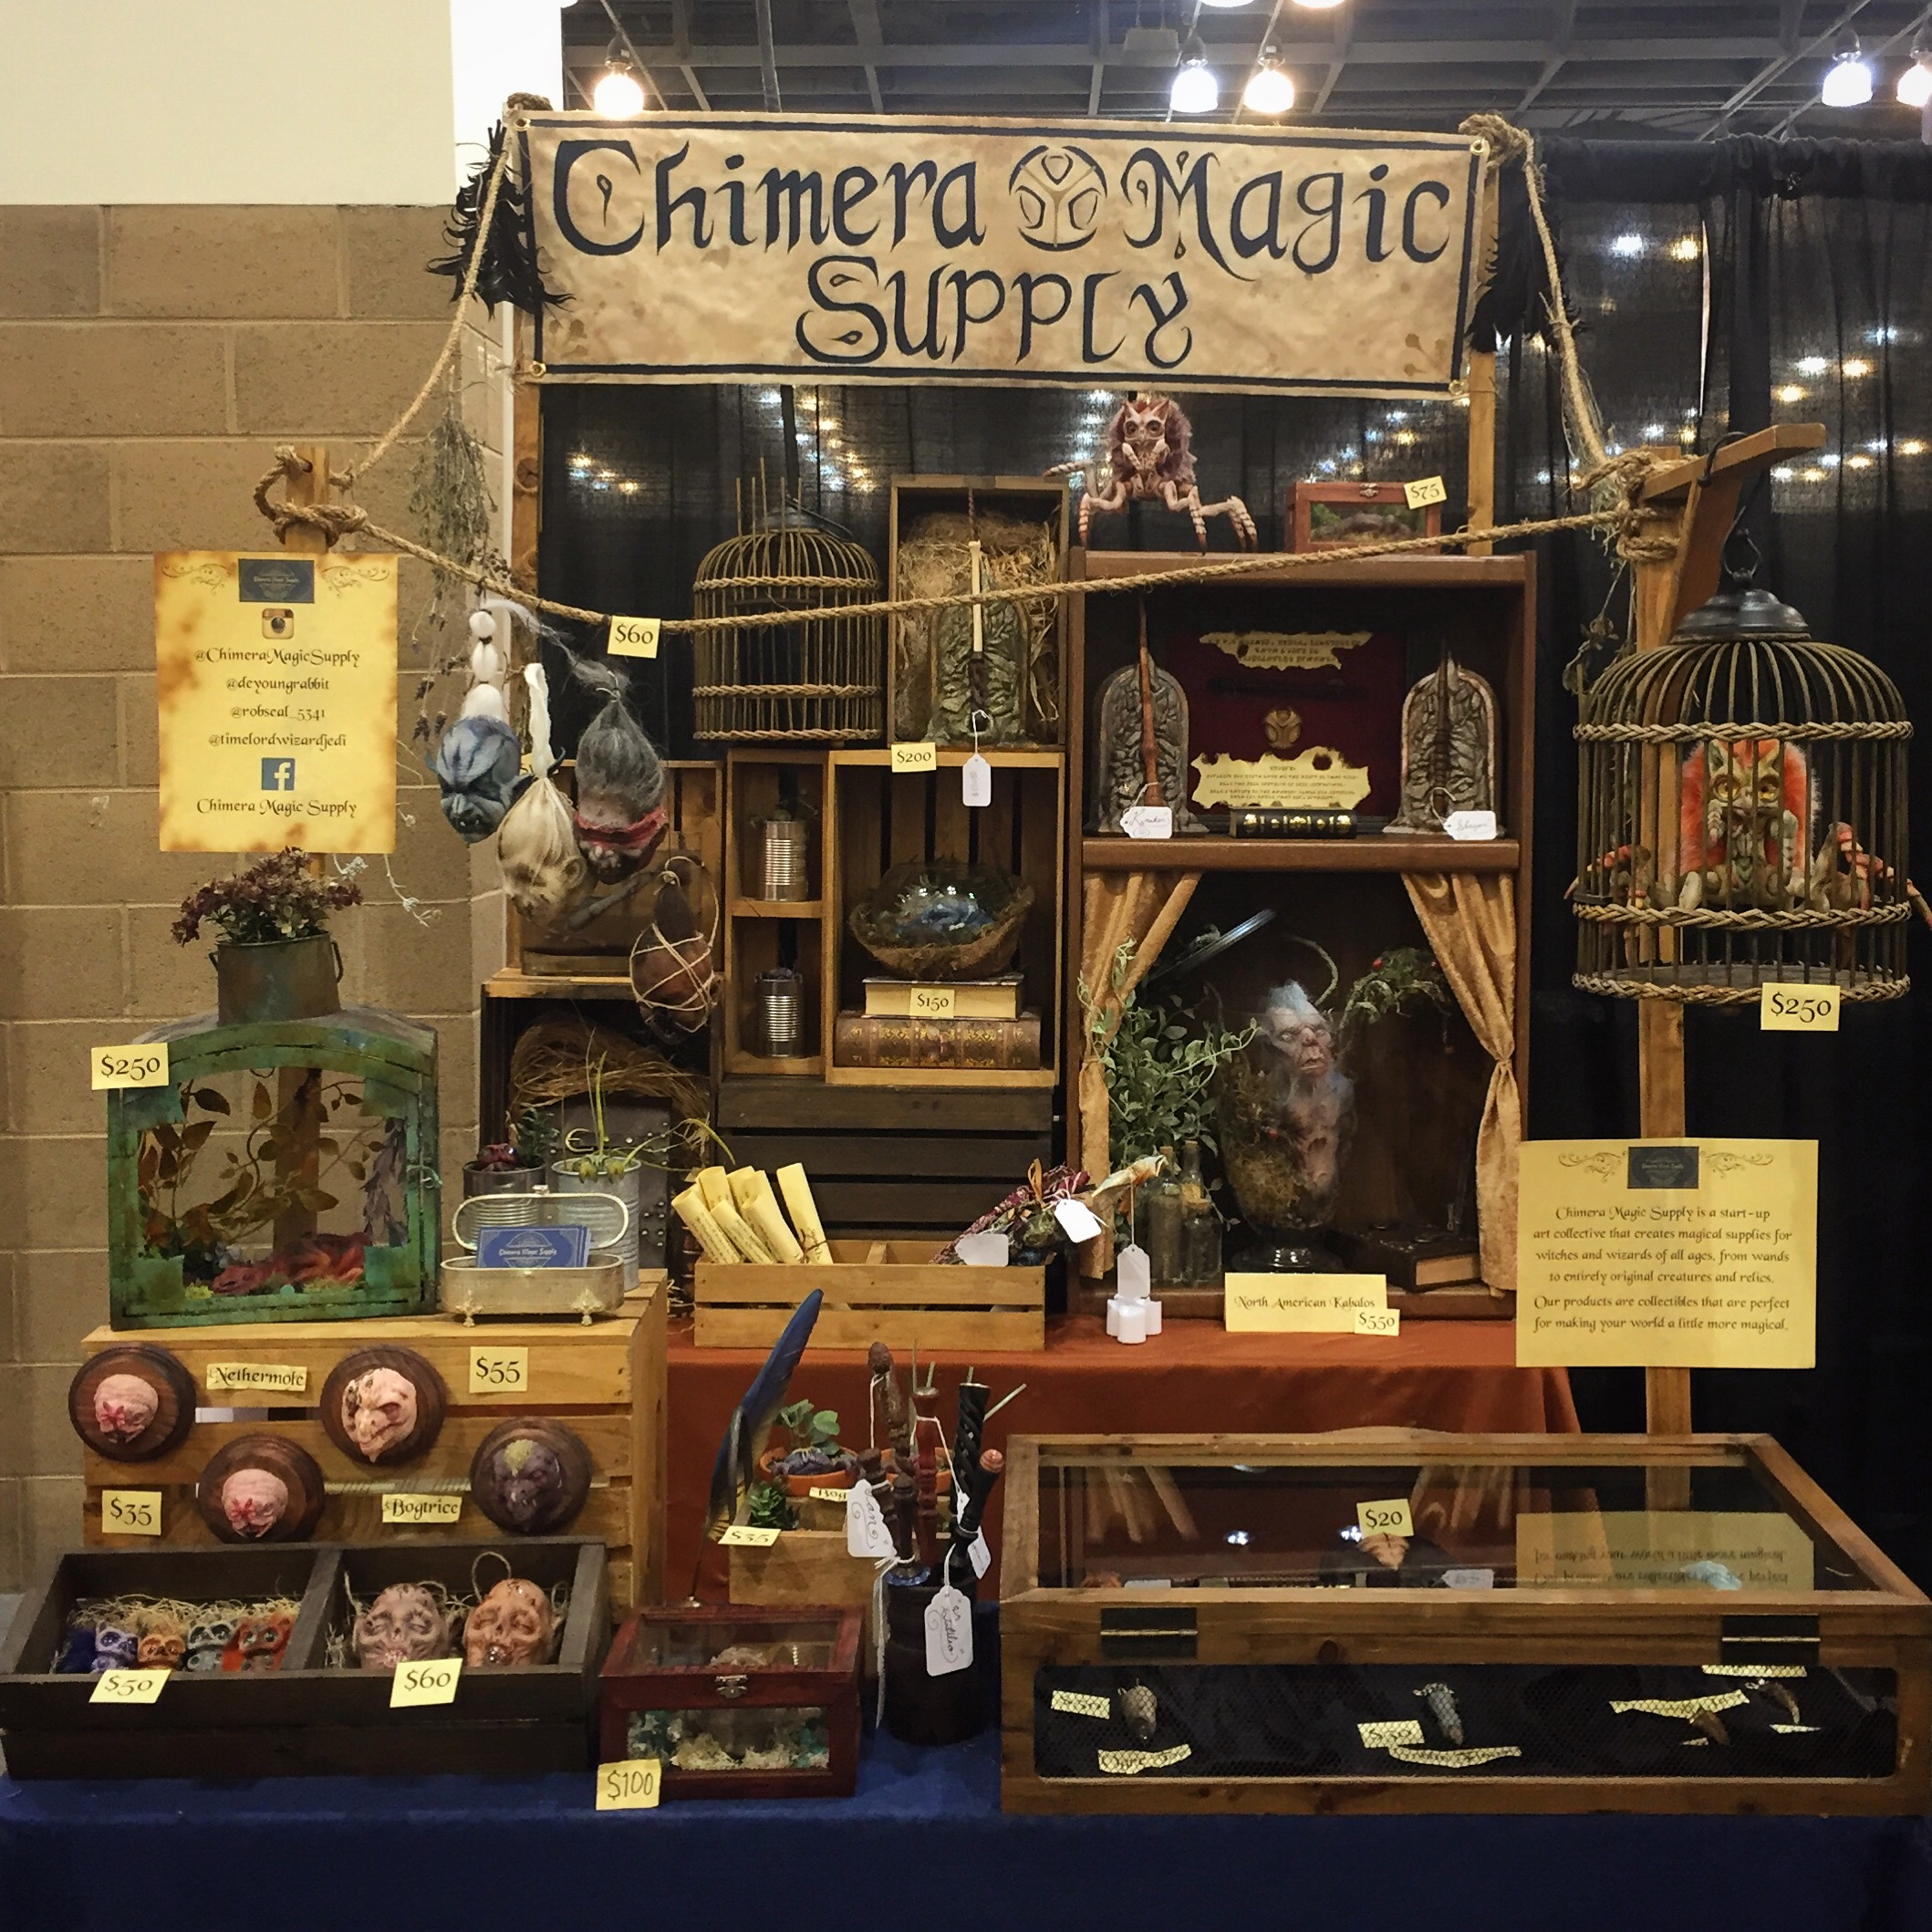 Chimera Magic Supply booth